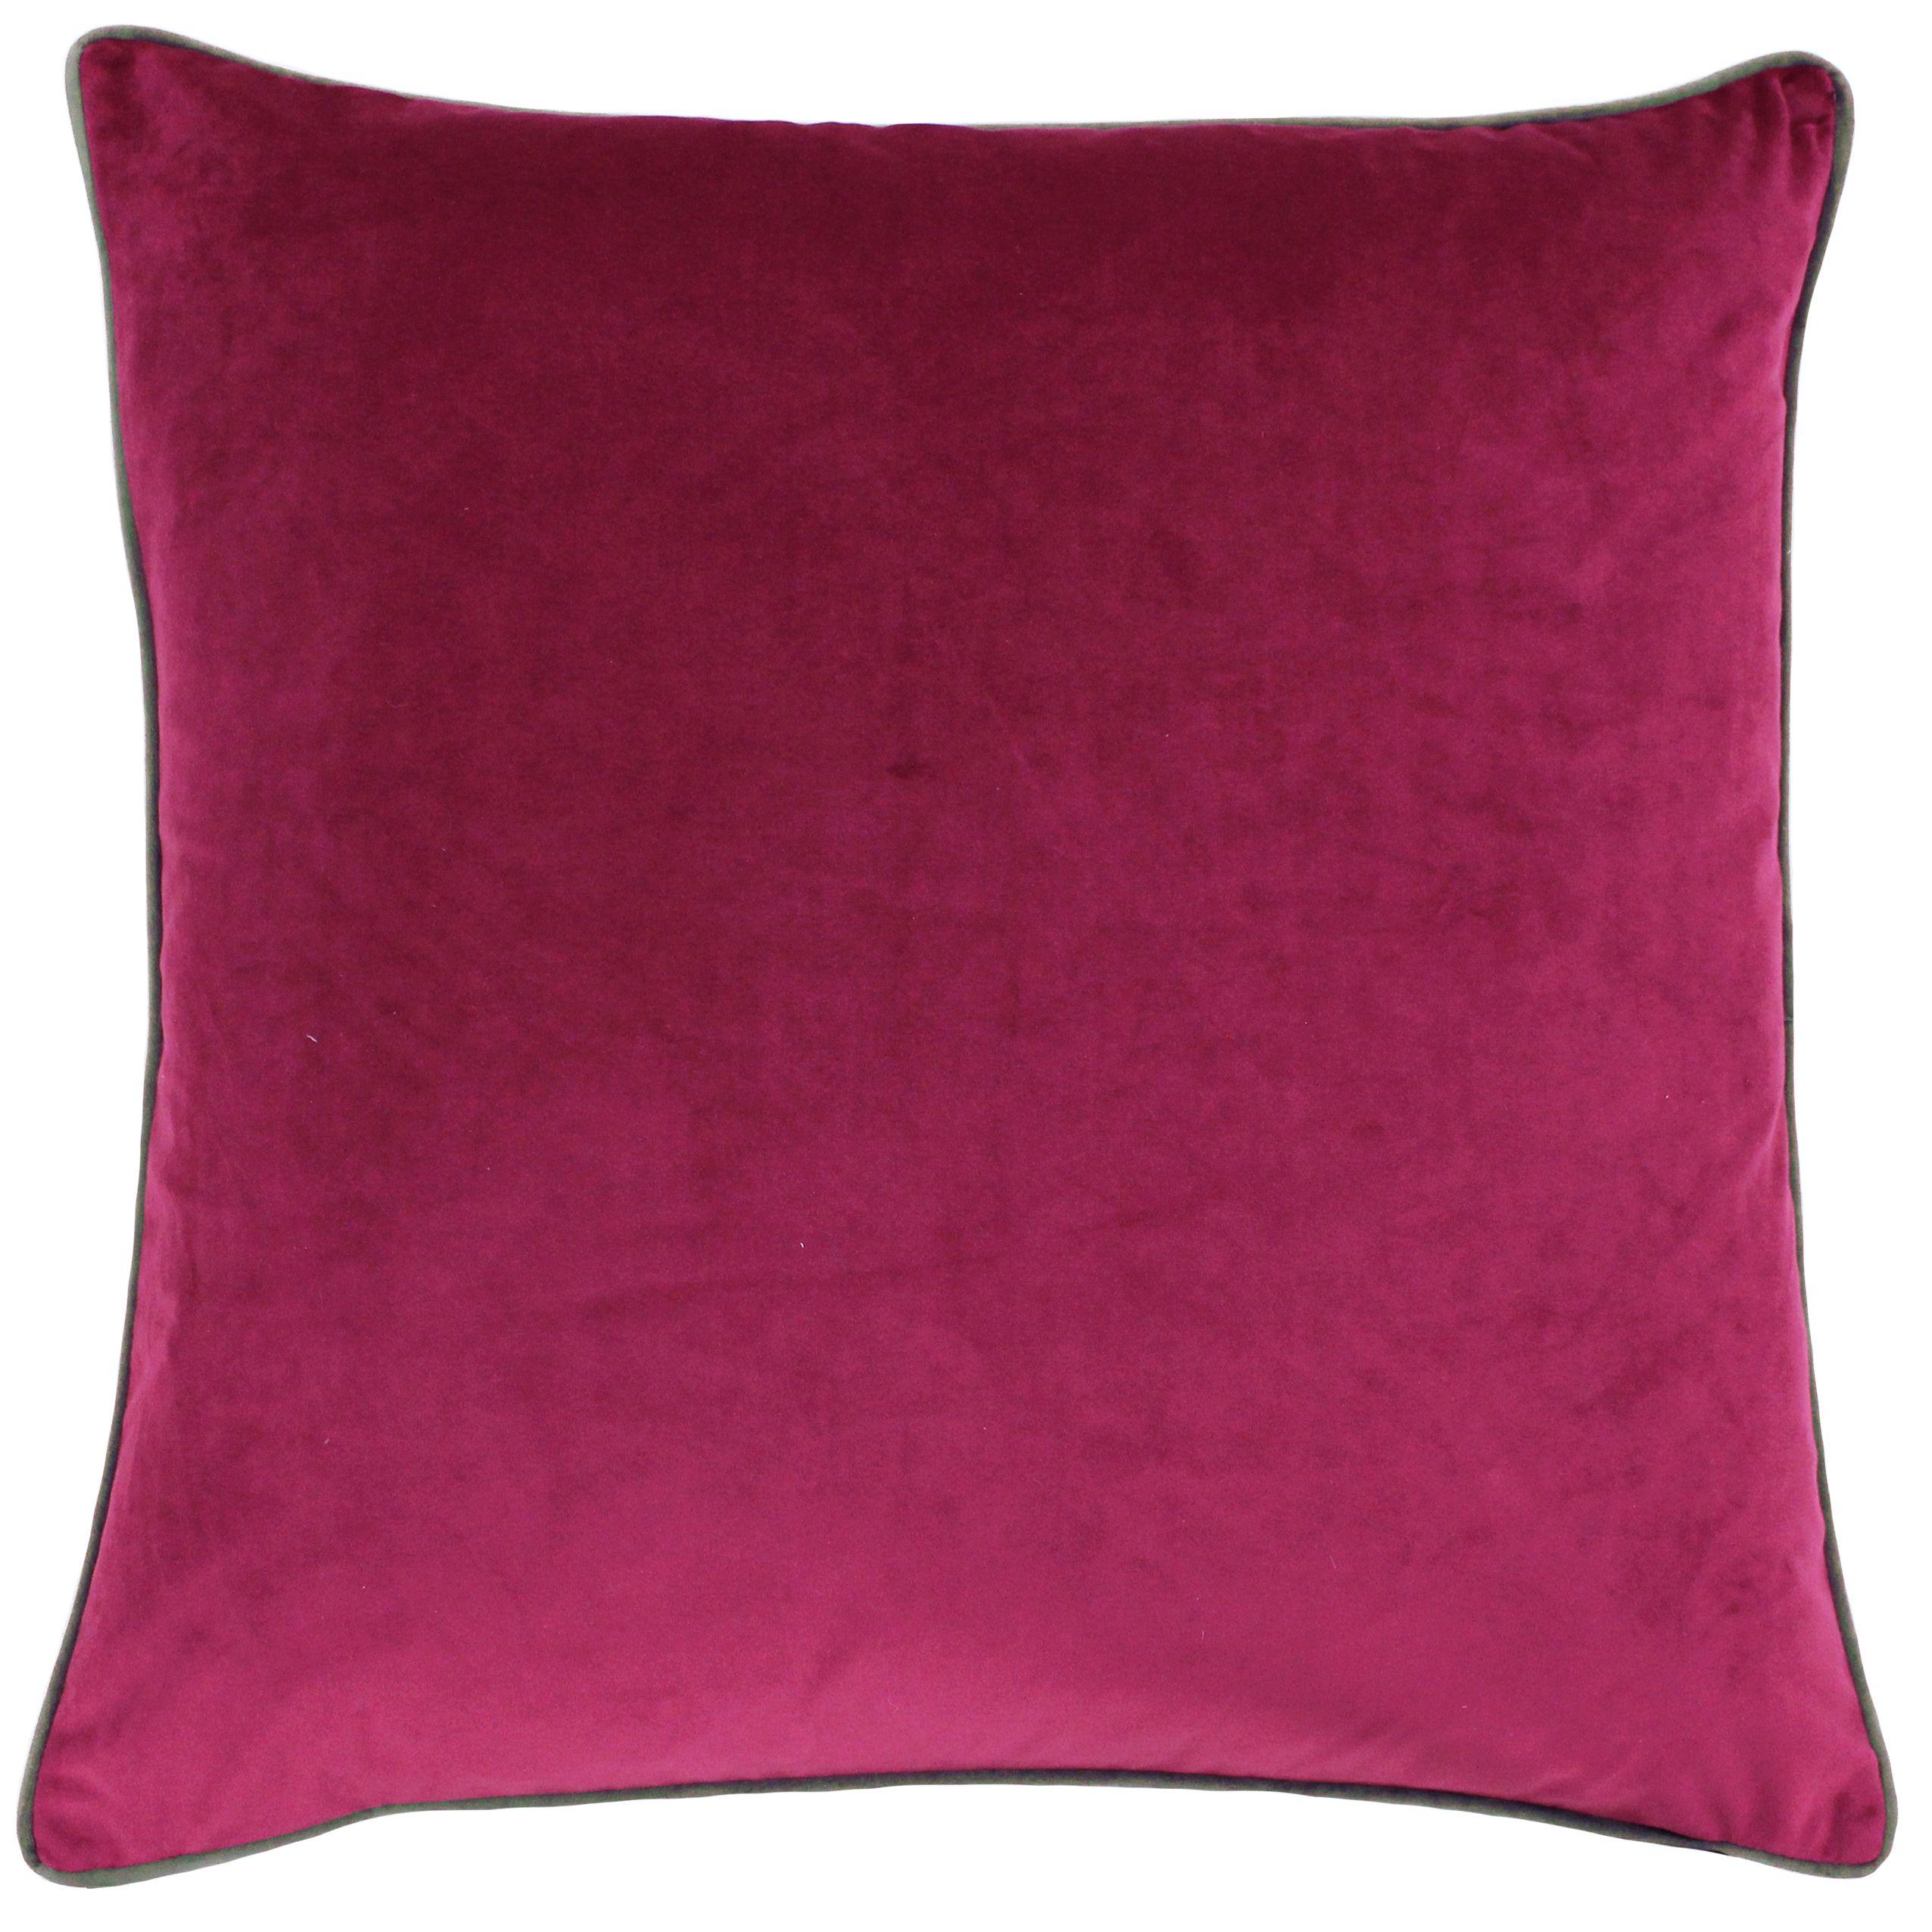 Meridian 55X55 Poly Cushion Cra/Moc